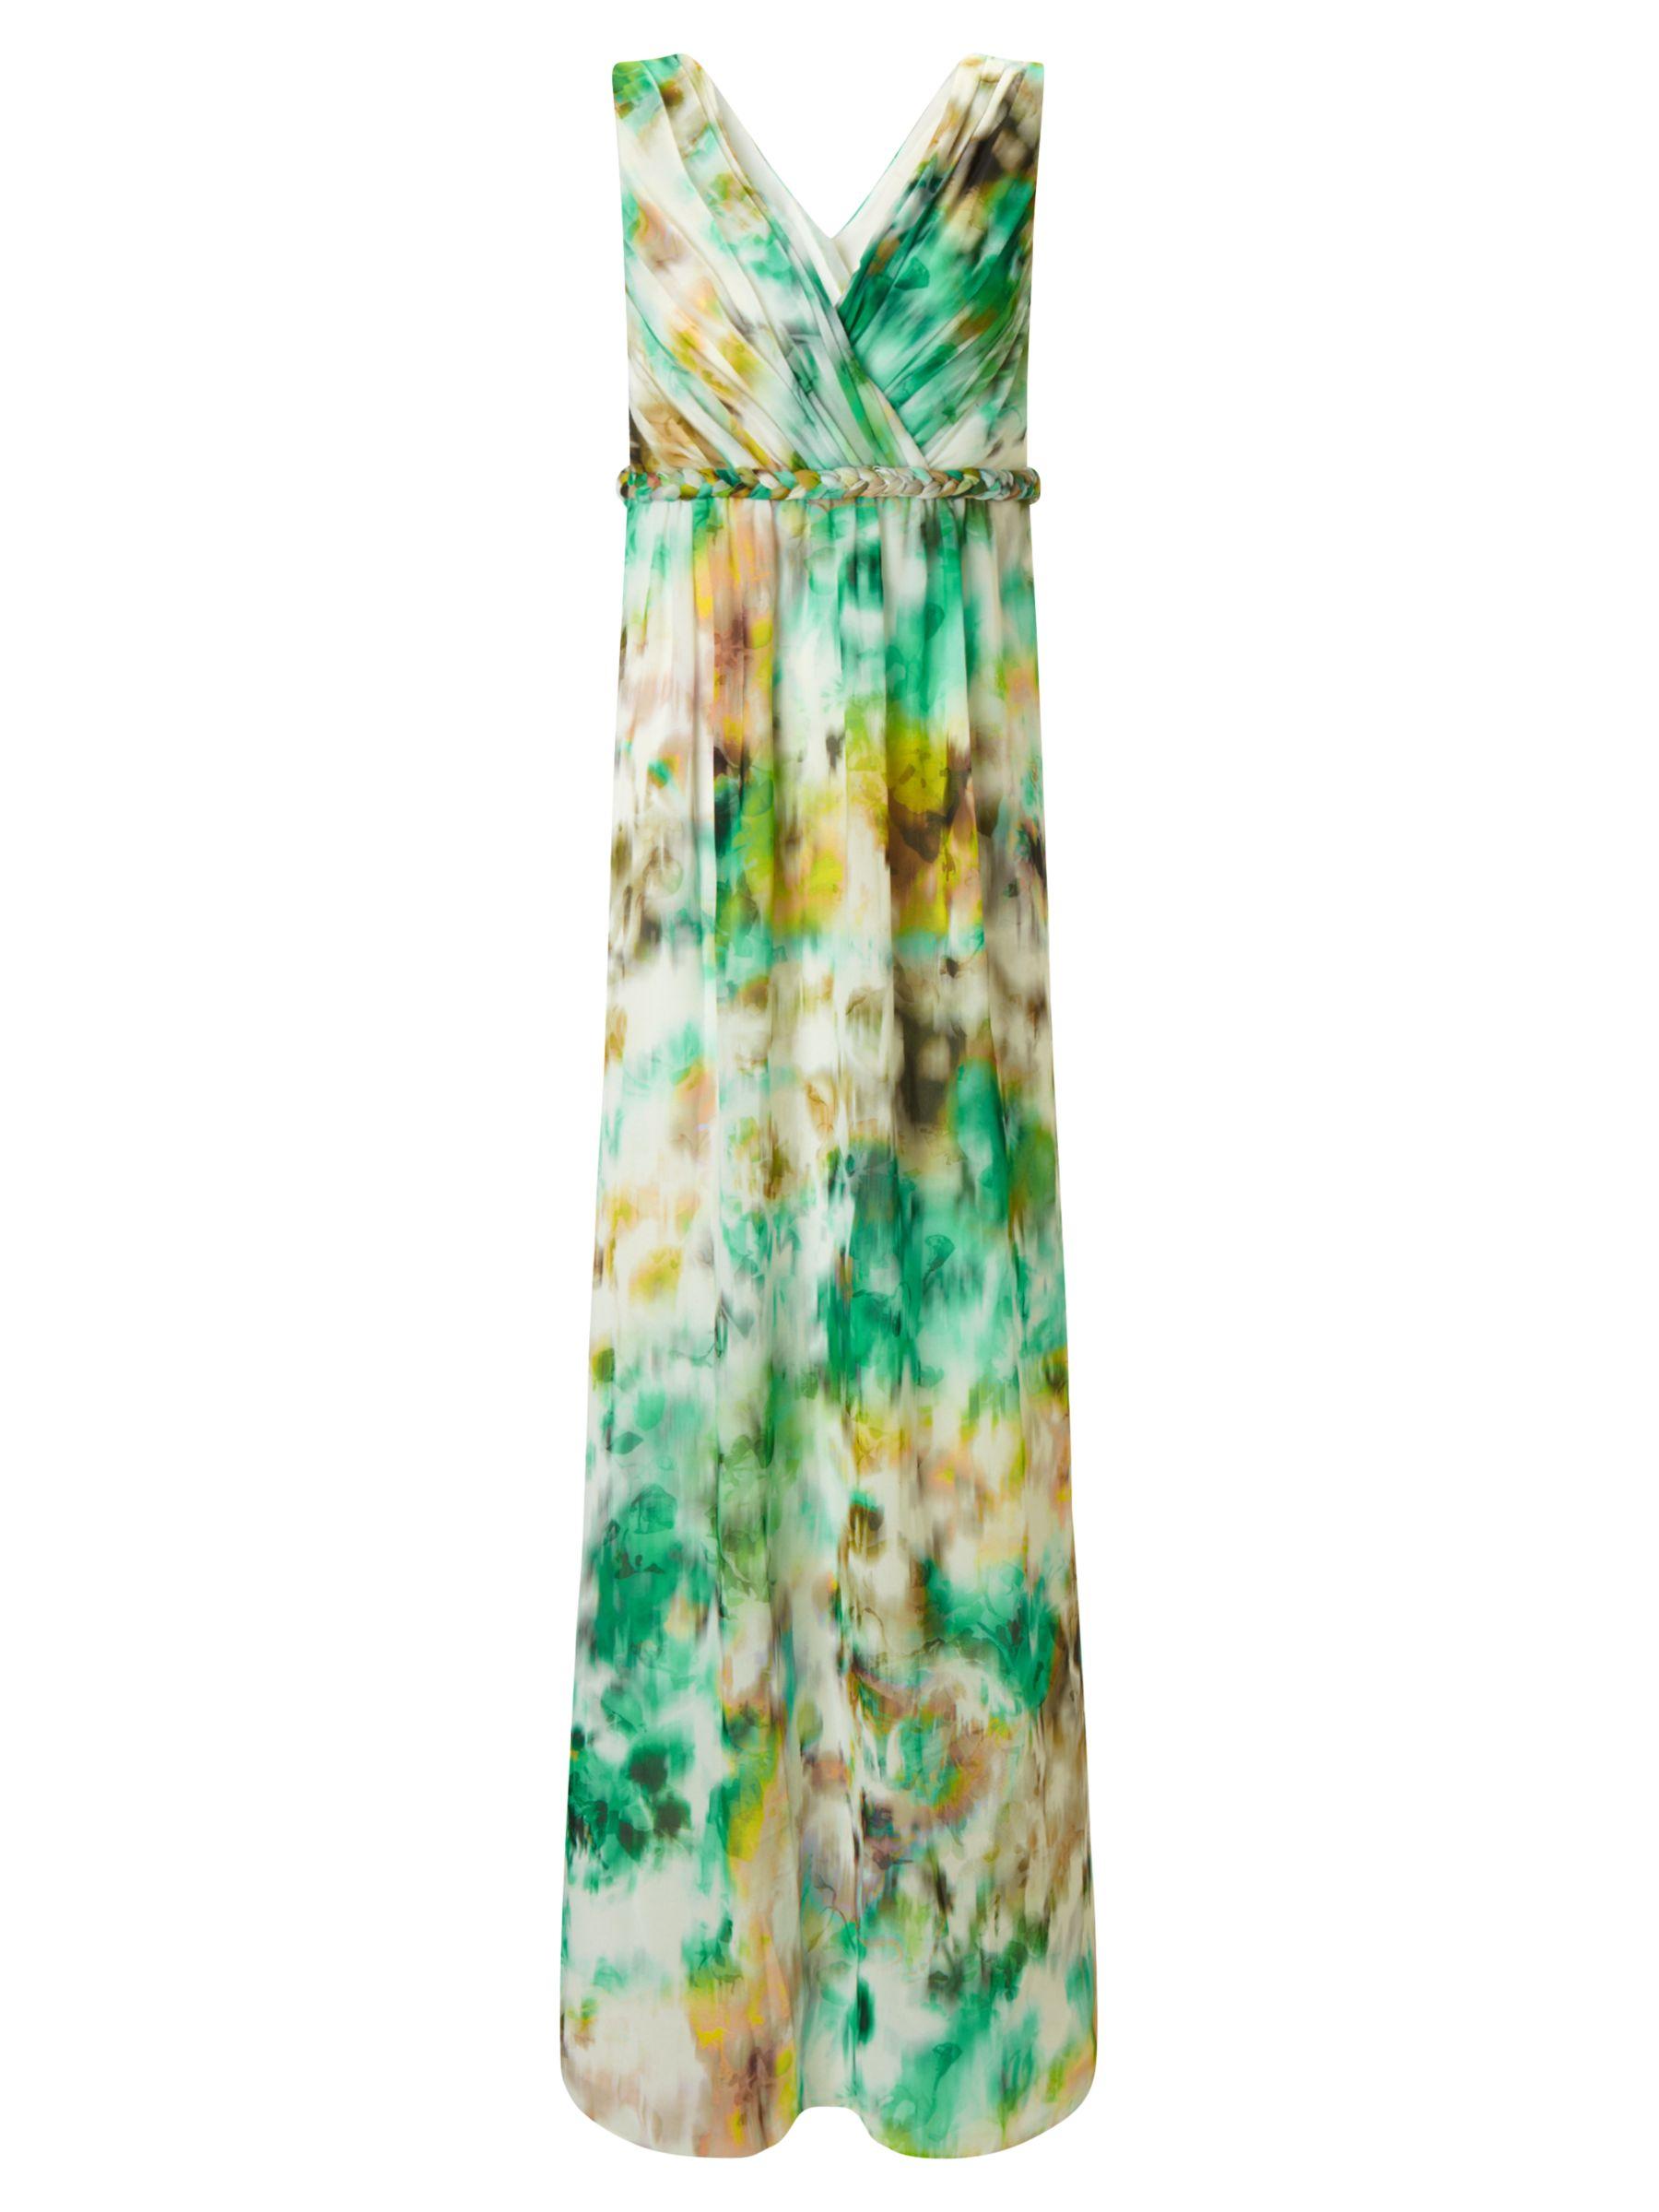 ariella kimberley maxi dress green/white/yellow, ariella, kimberley, maxi, dress, green/white/yellow, 8|10|18|16|14|12, women, plus size, womens dresses, gifts, wedding, wedding clothing, female guests, 1841112